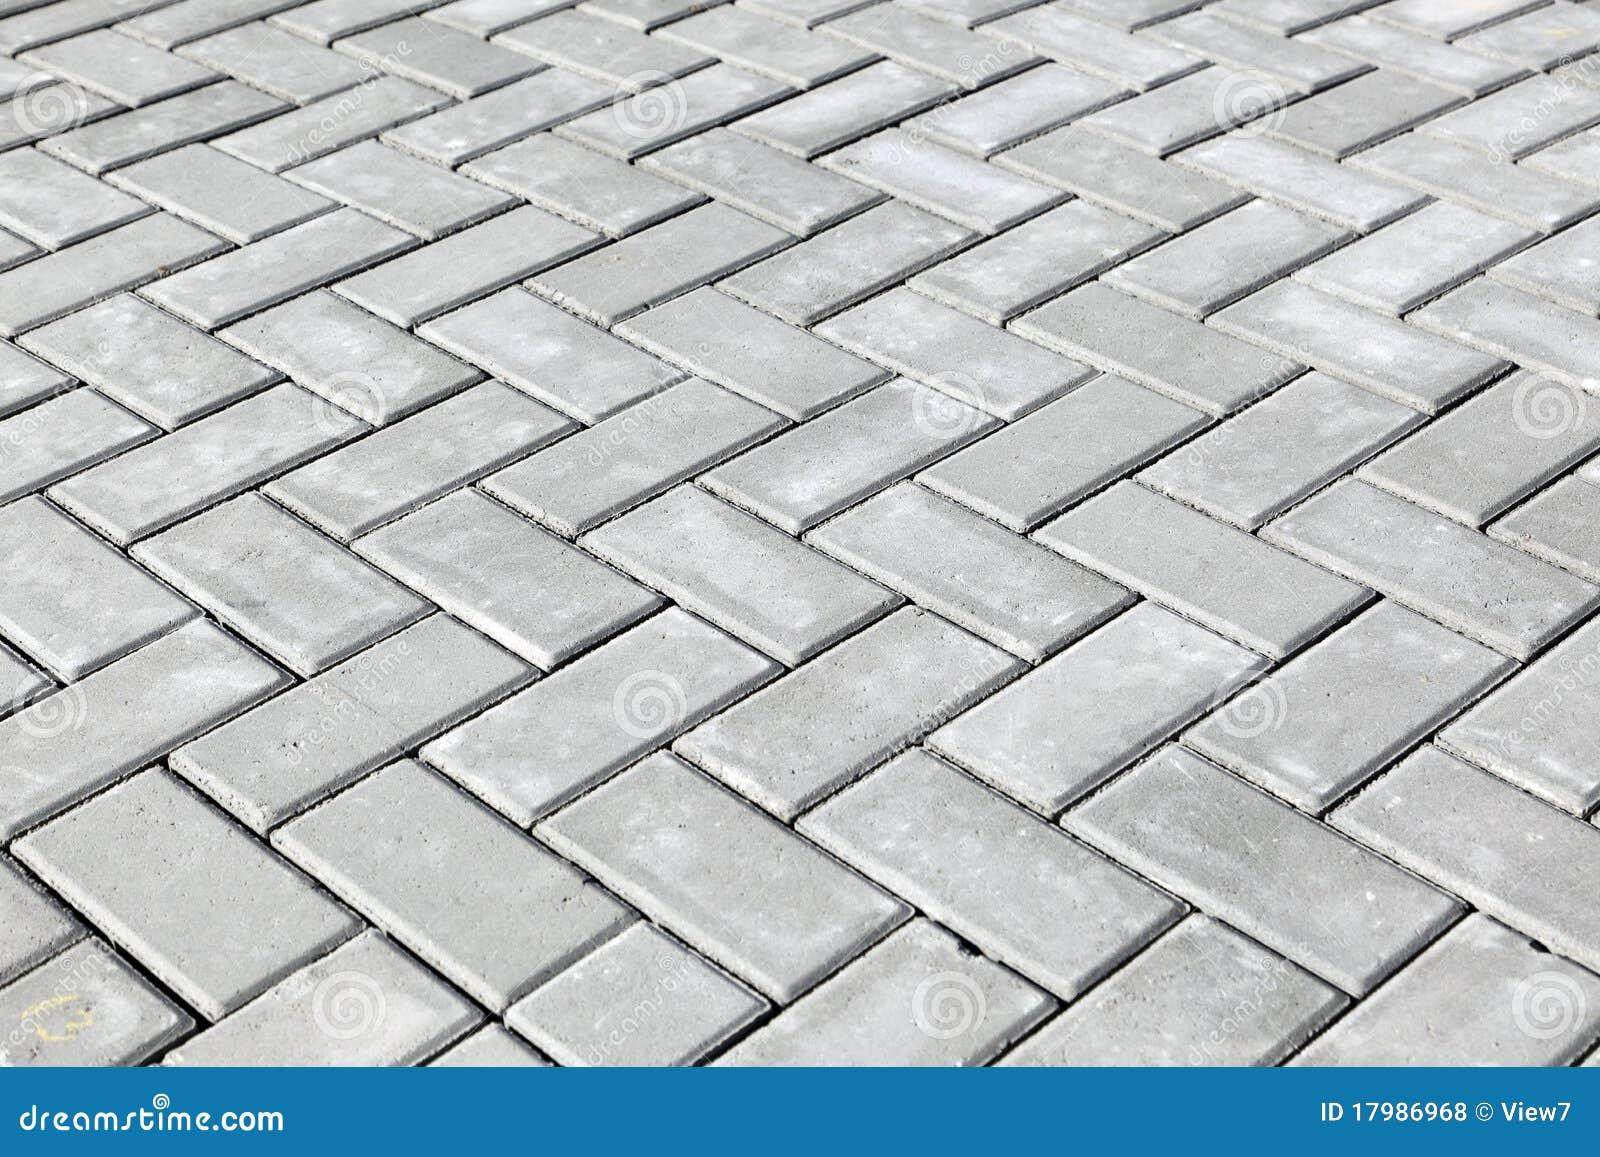 Concrete Brick Pattern Royalty Free Stock Photos Image